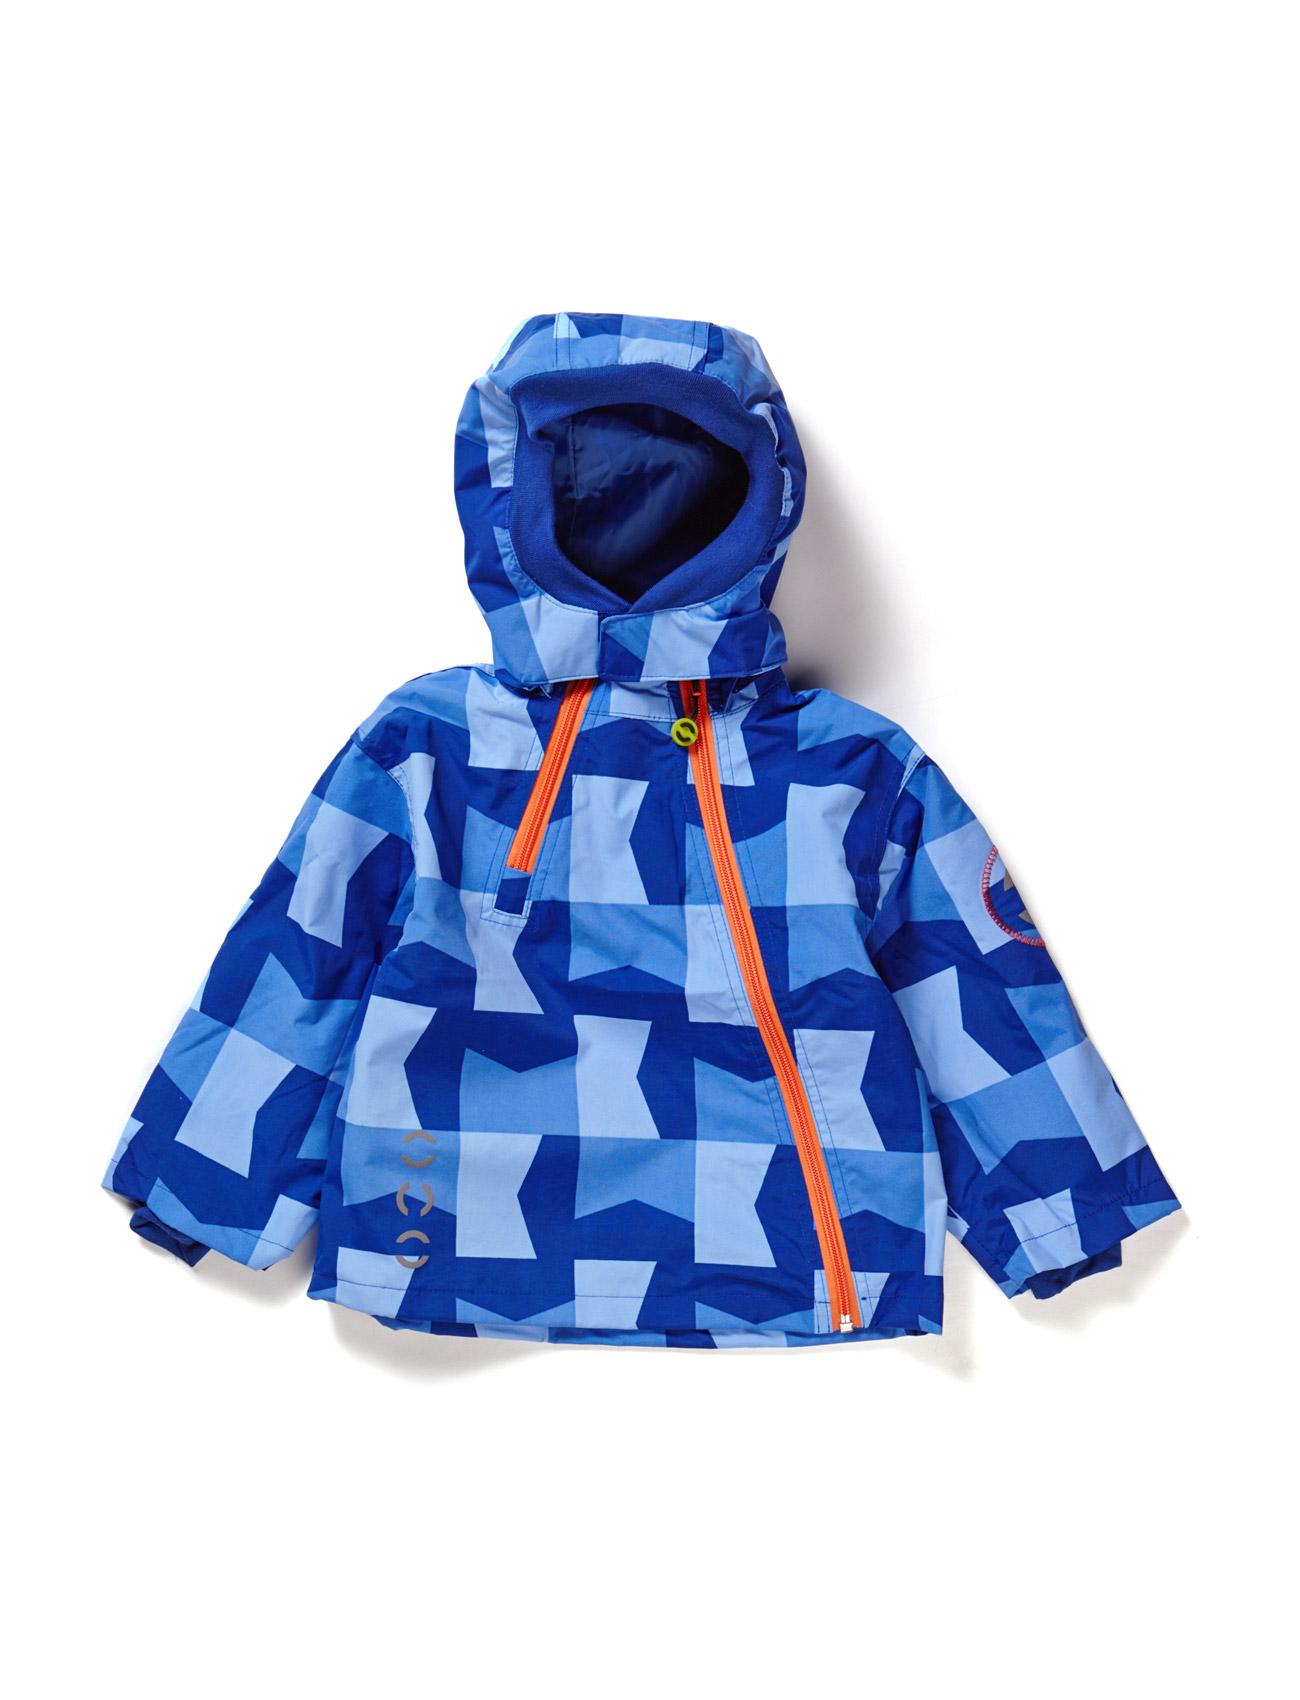 Nylon Baby Jacket, Aop